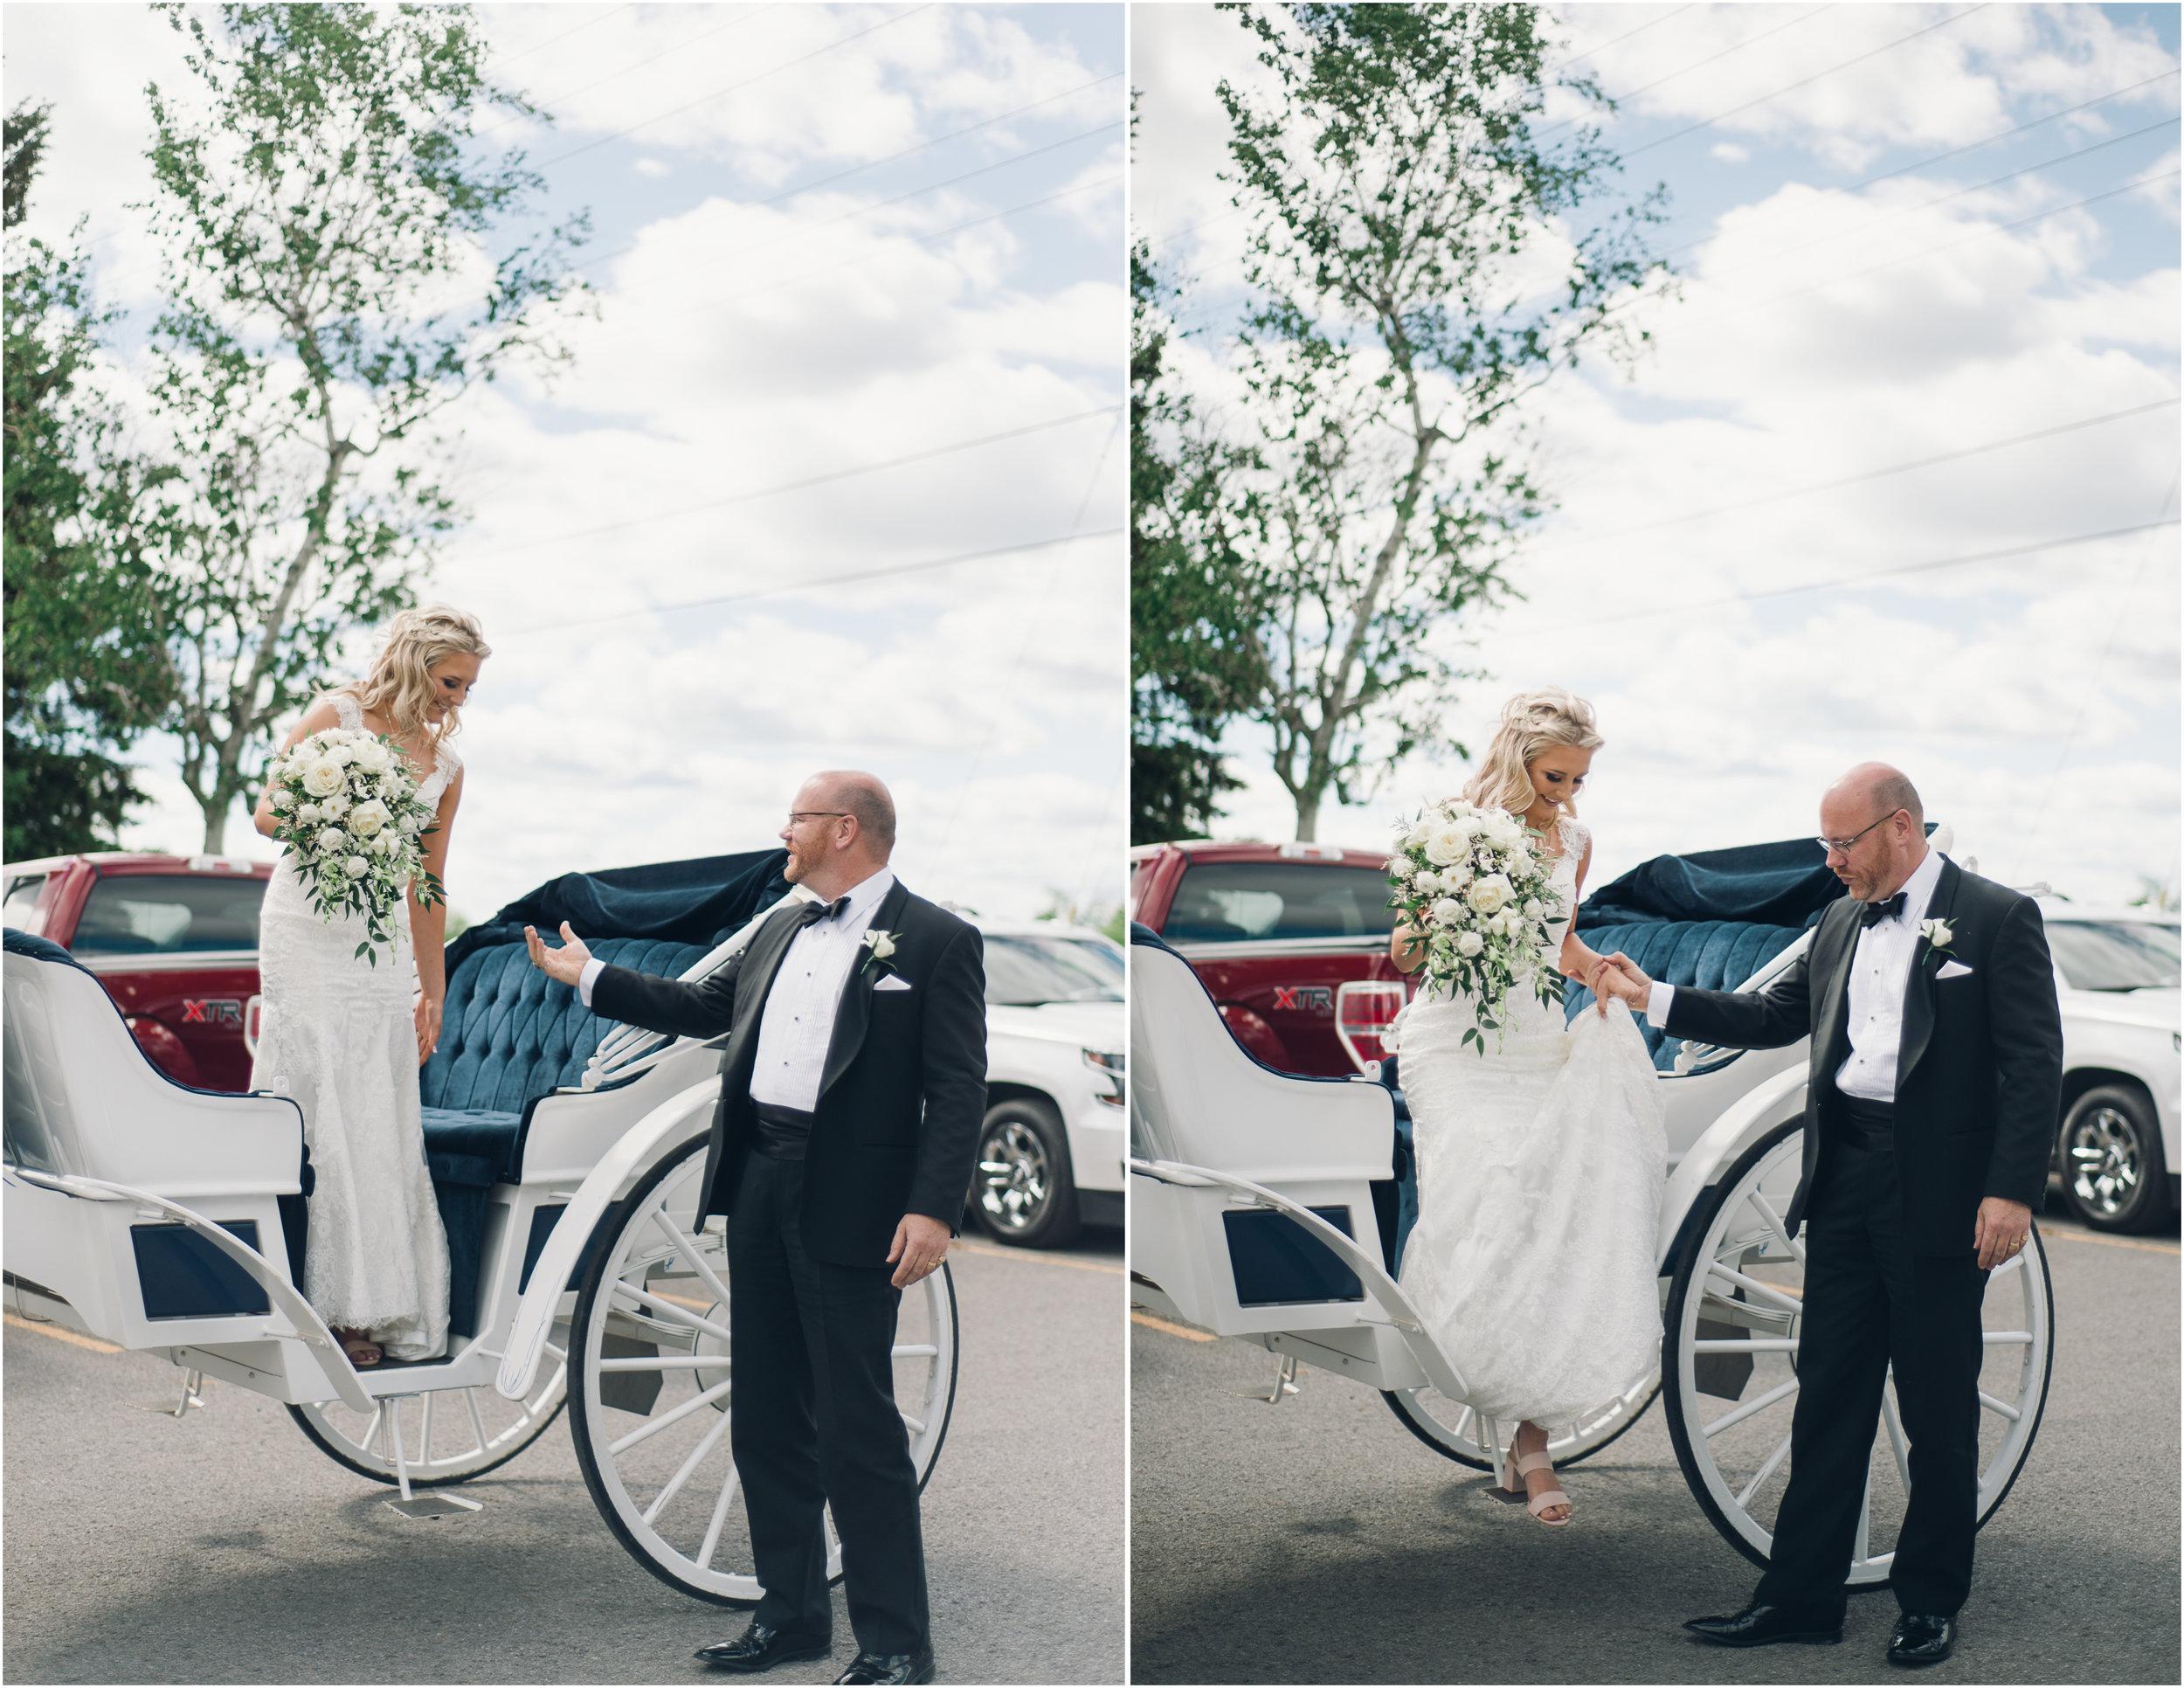 Kingston Wedding_2x2_5.jpg